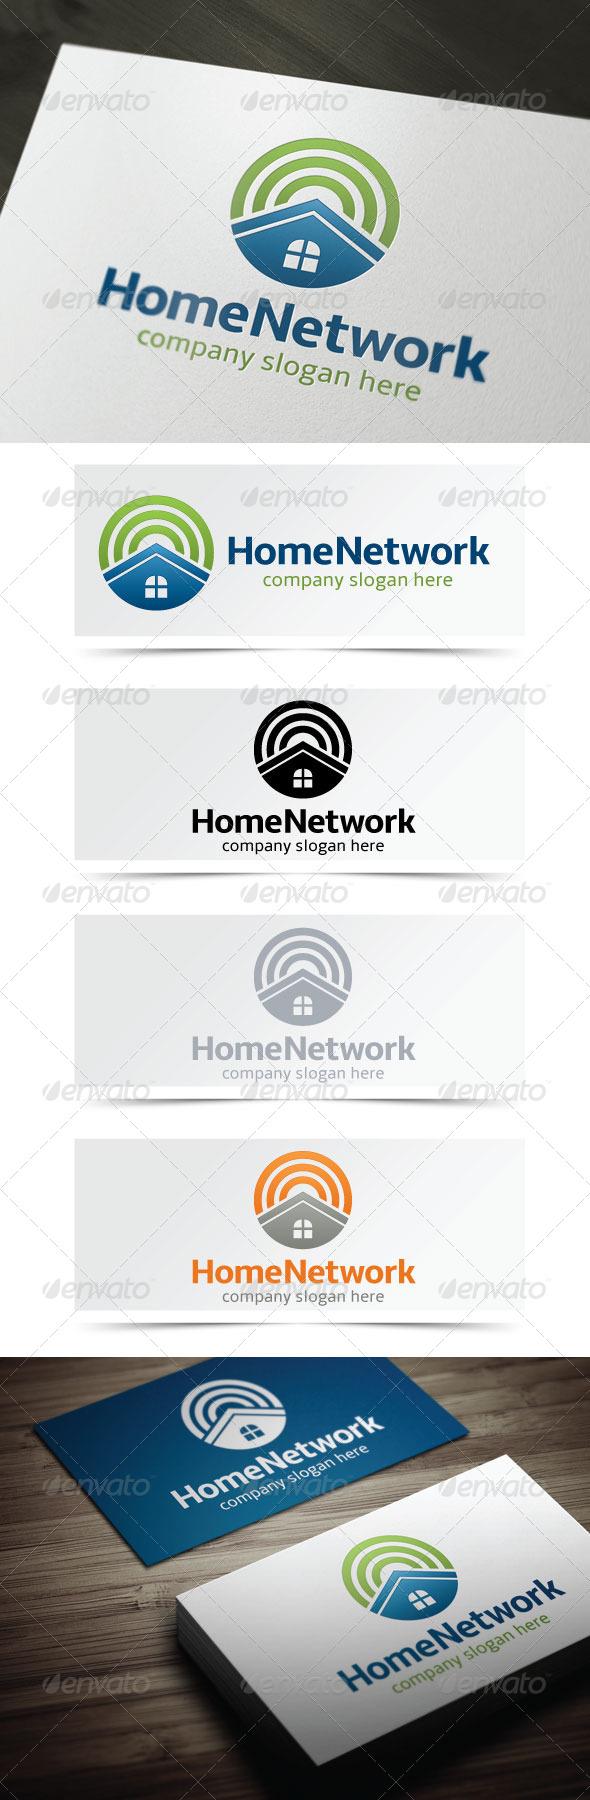 GraphicRiver Home Network 4843681